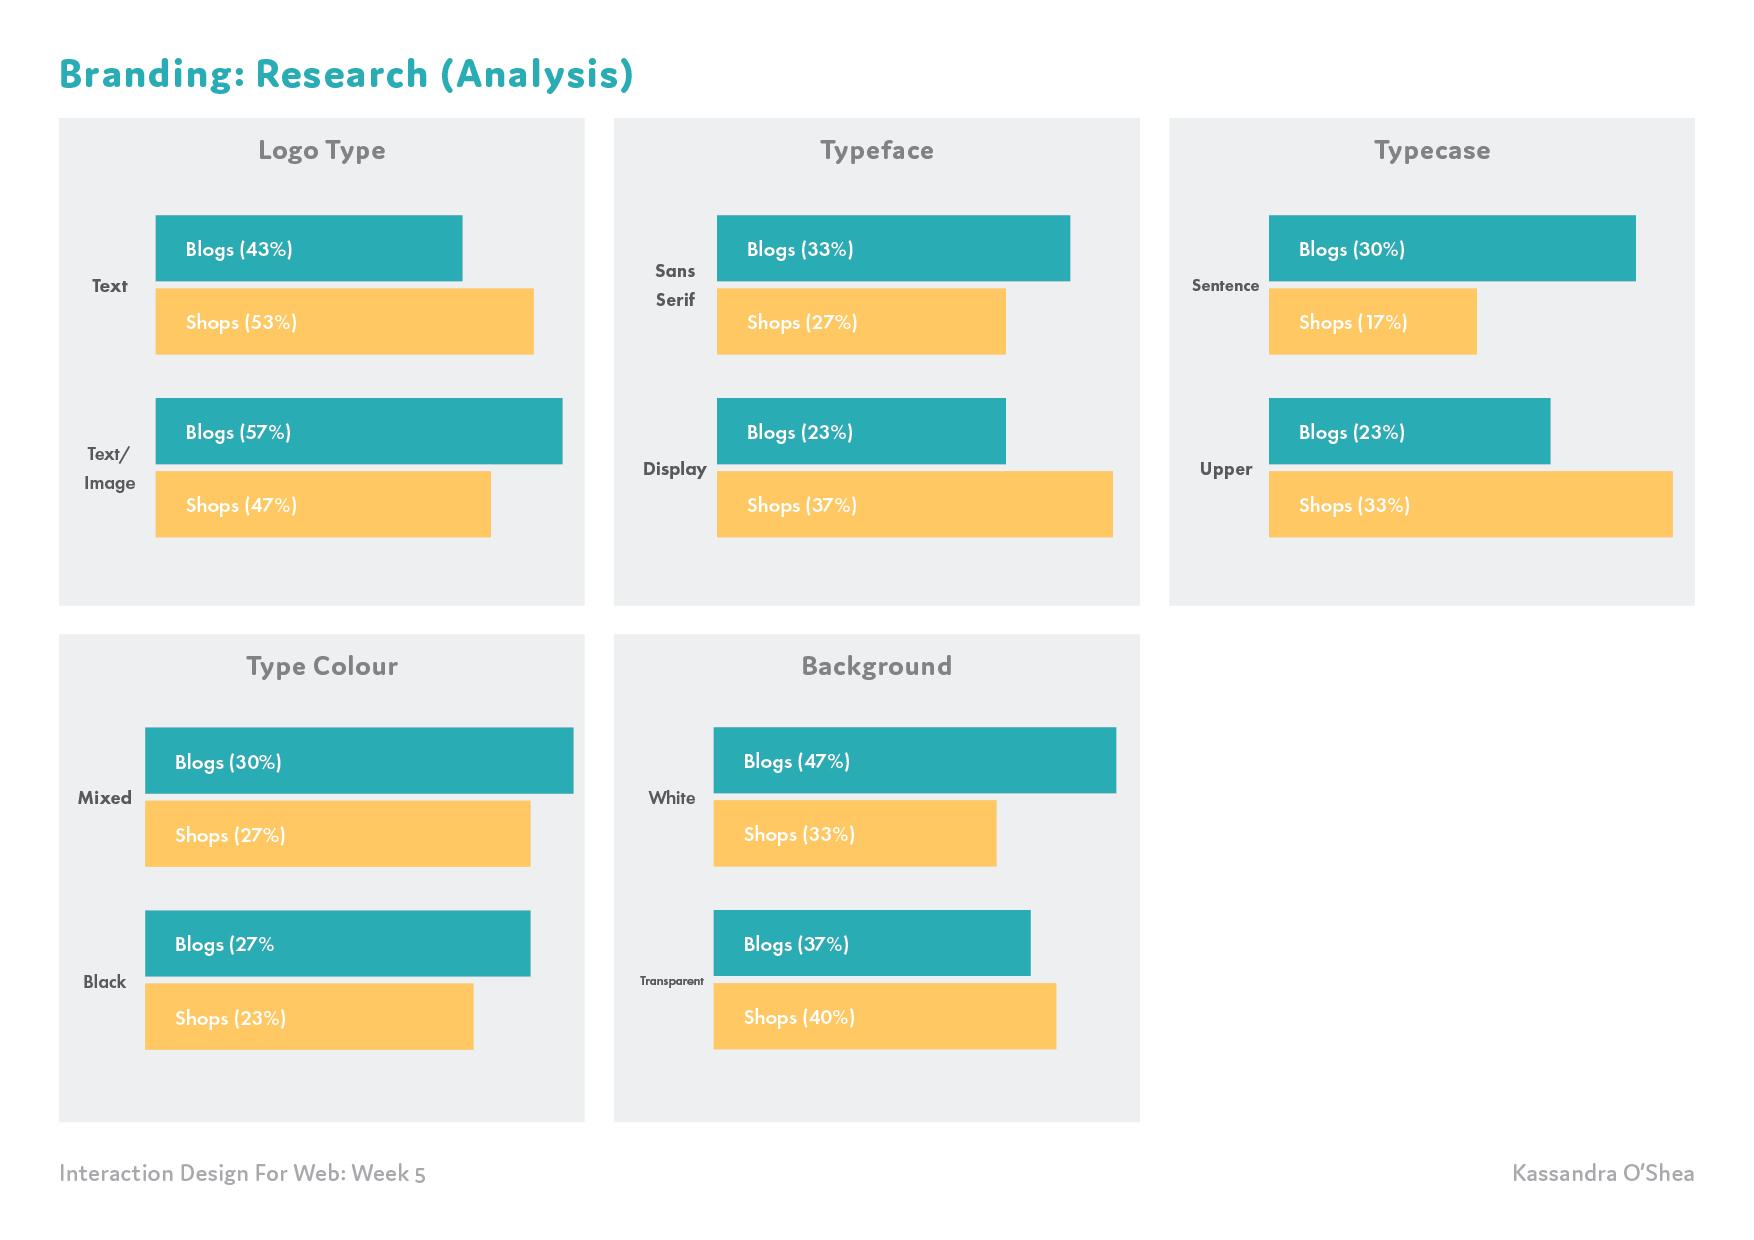 Branding: Research (Analysis)